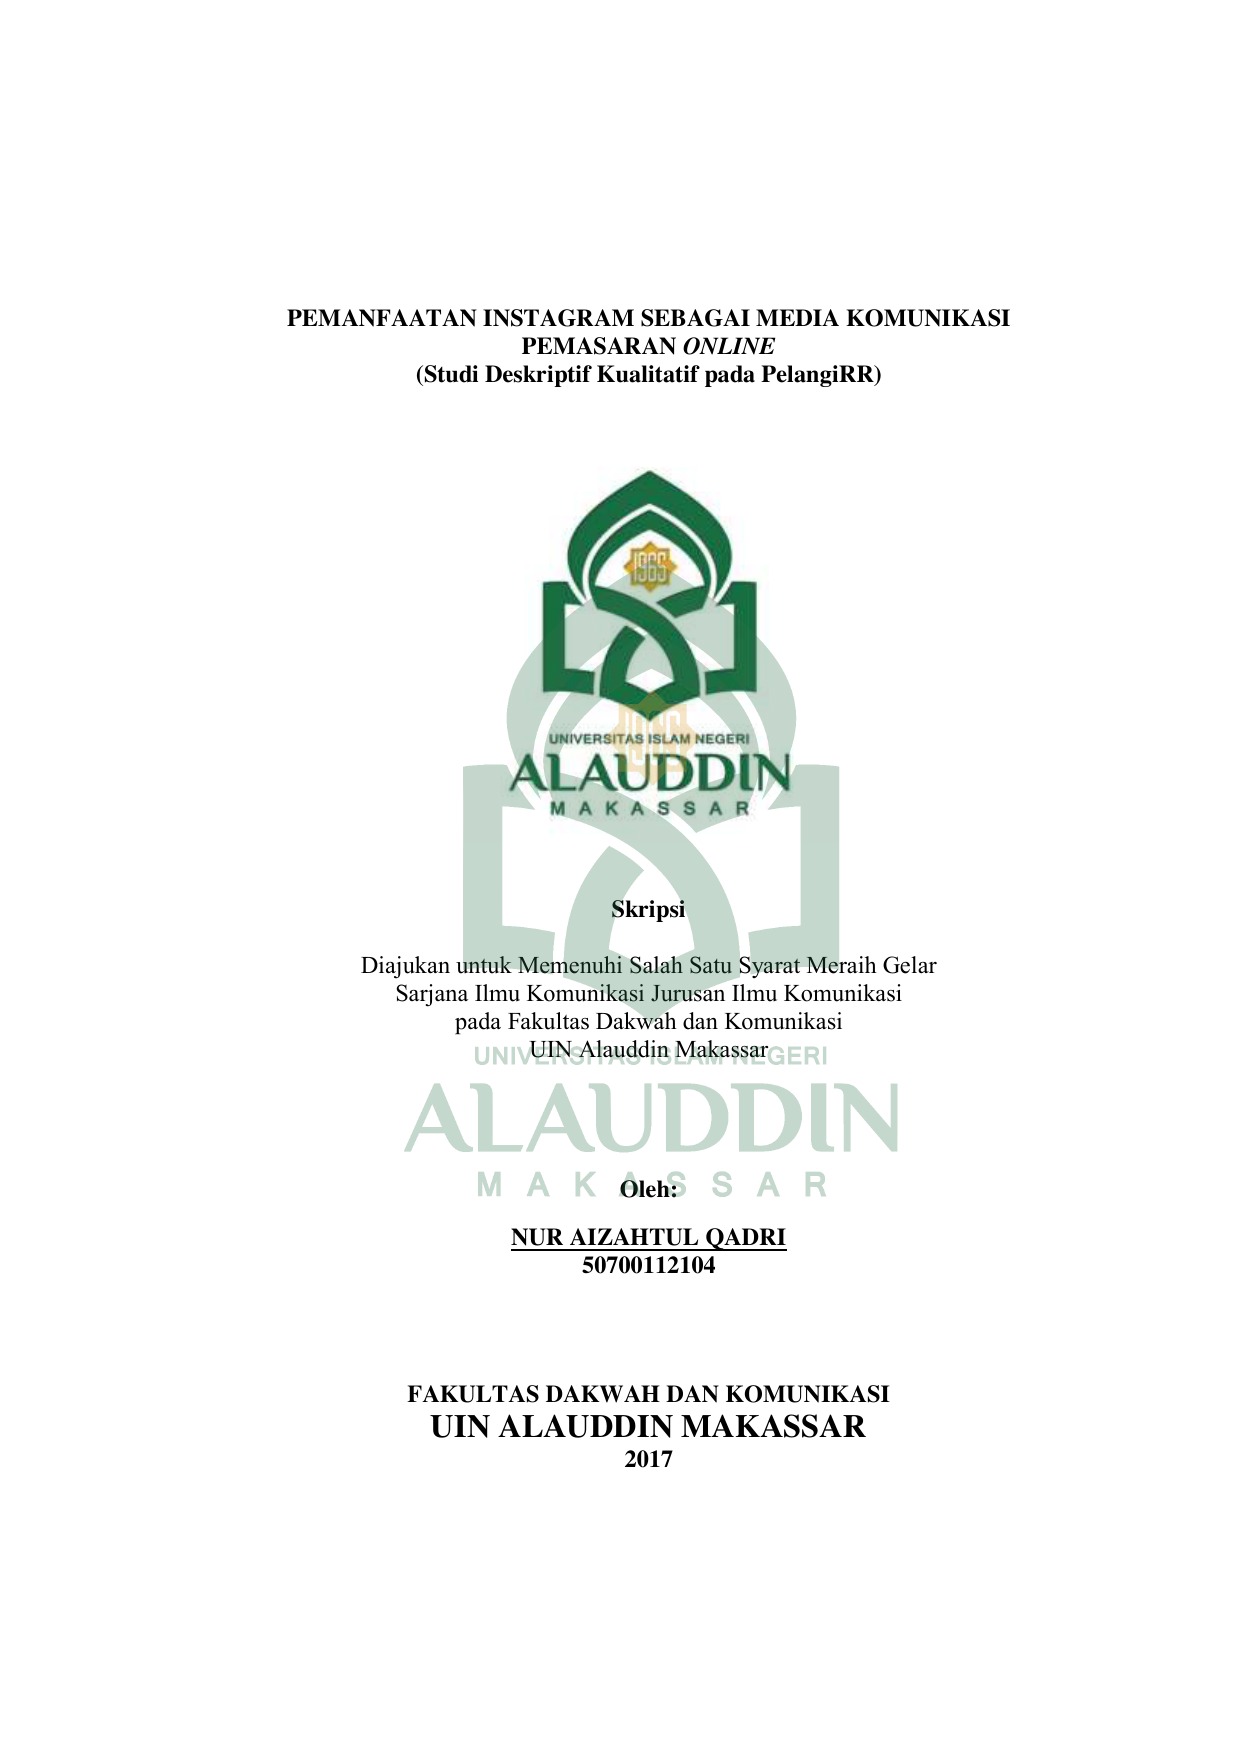 10mb Repositori Uin Alauddin Makassar